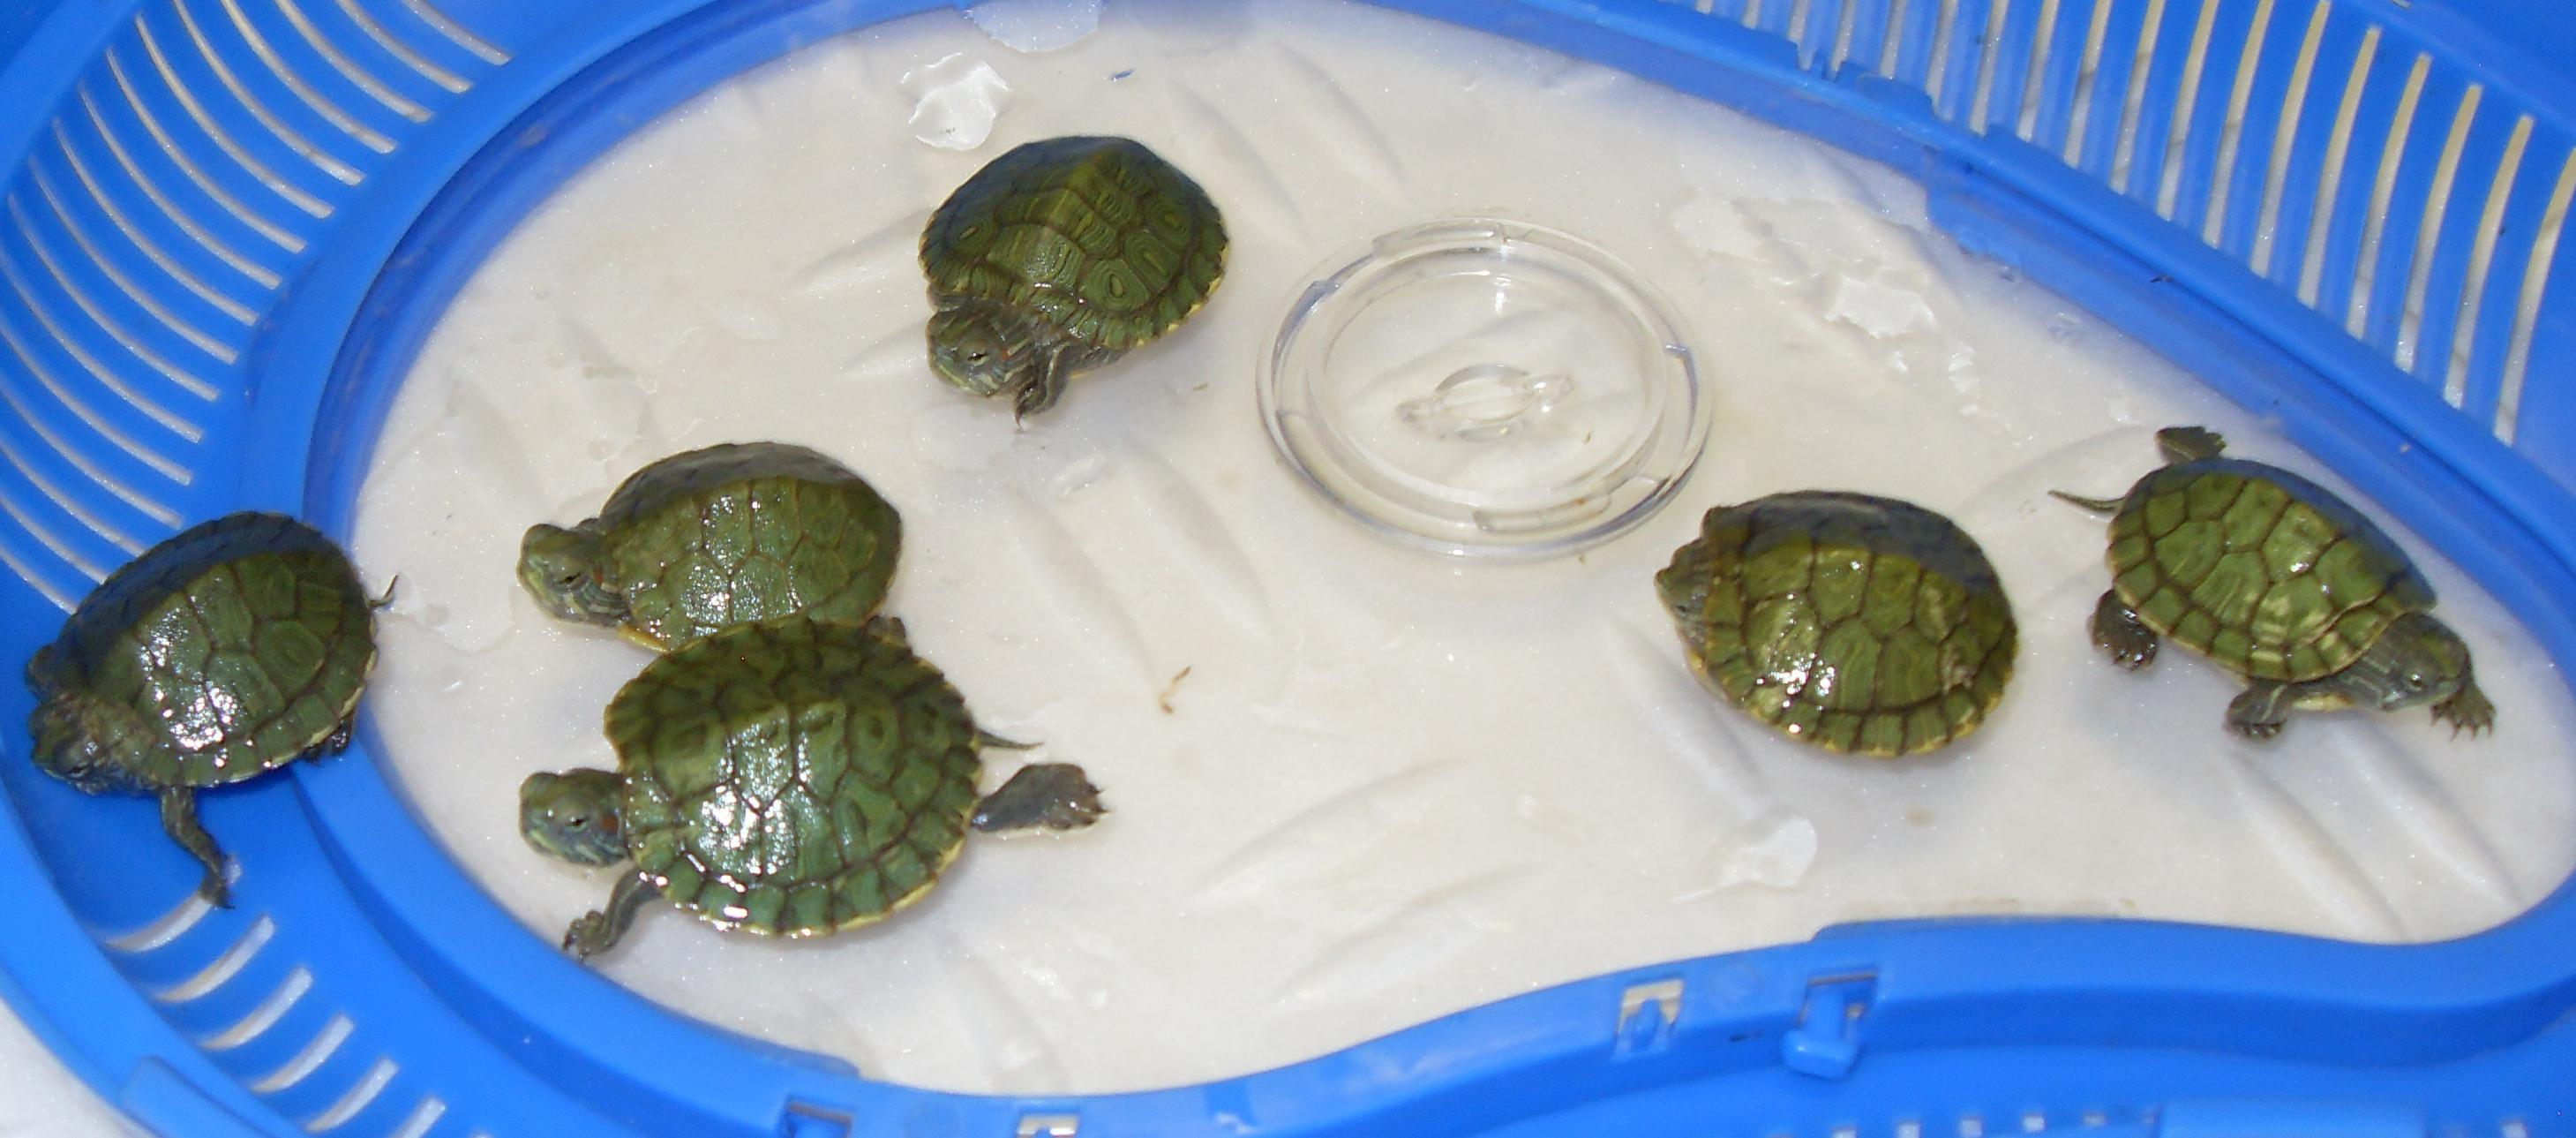 Домашняя черепаха красноухая уход в домашних условиях фото